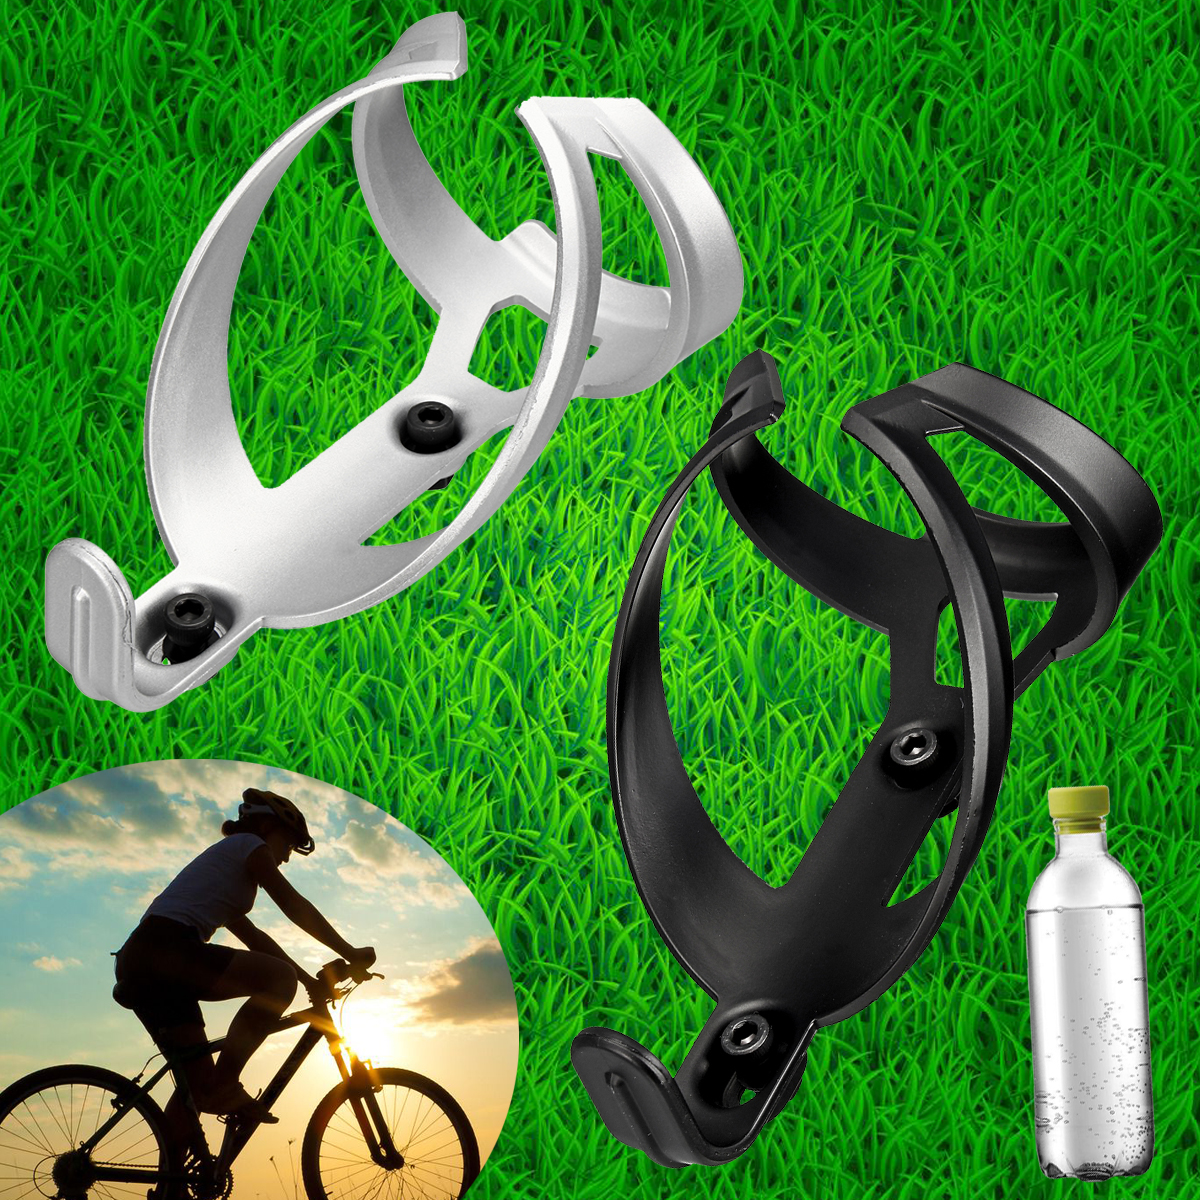 Nylon Fiber Drink Bottle Water Cage Rack Holder Bracket Bicycle Cycle Sport Bike